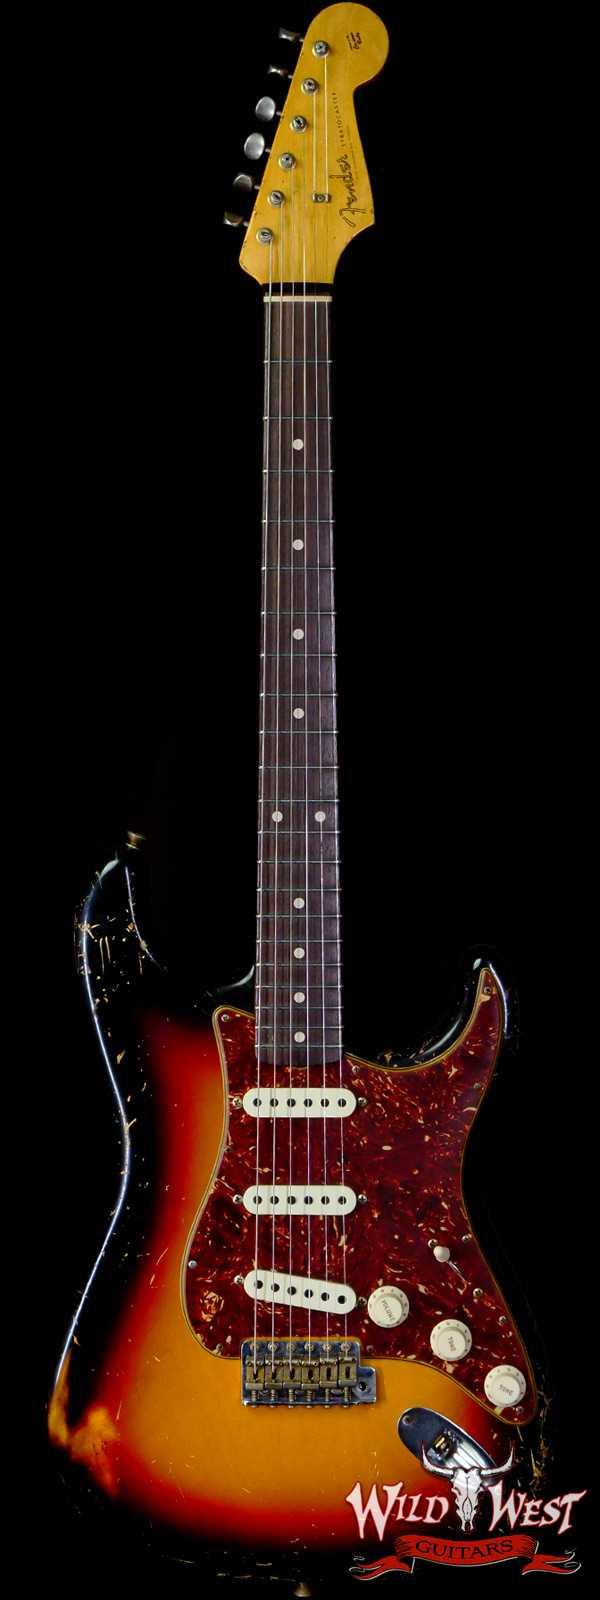 Fender Custom Shop Dennis Galuszka Masterbuilt 1960 Stratocaster Relic Josefina Hand-Wound Pickups 3 Tone Sunburst